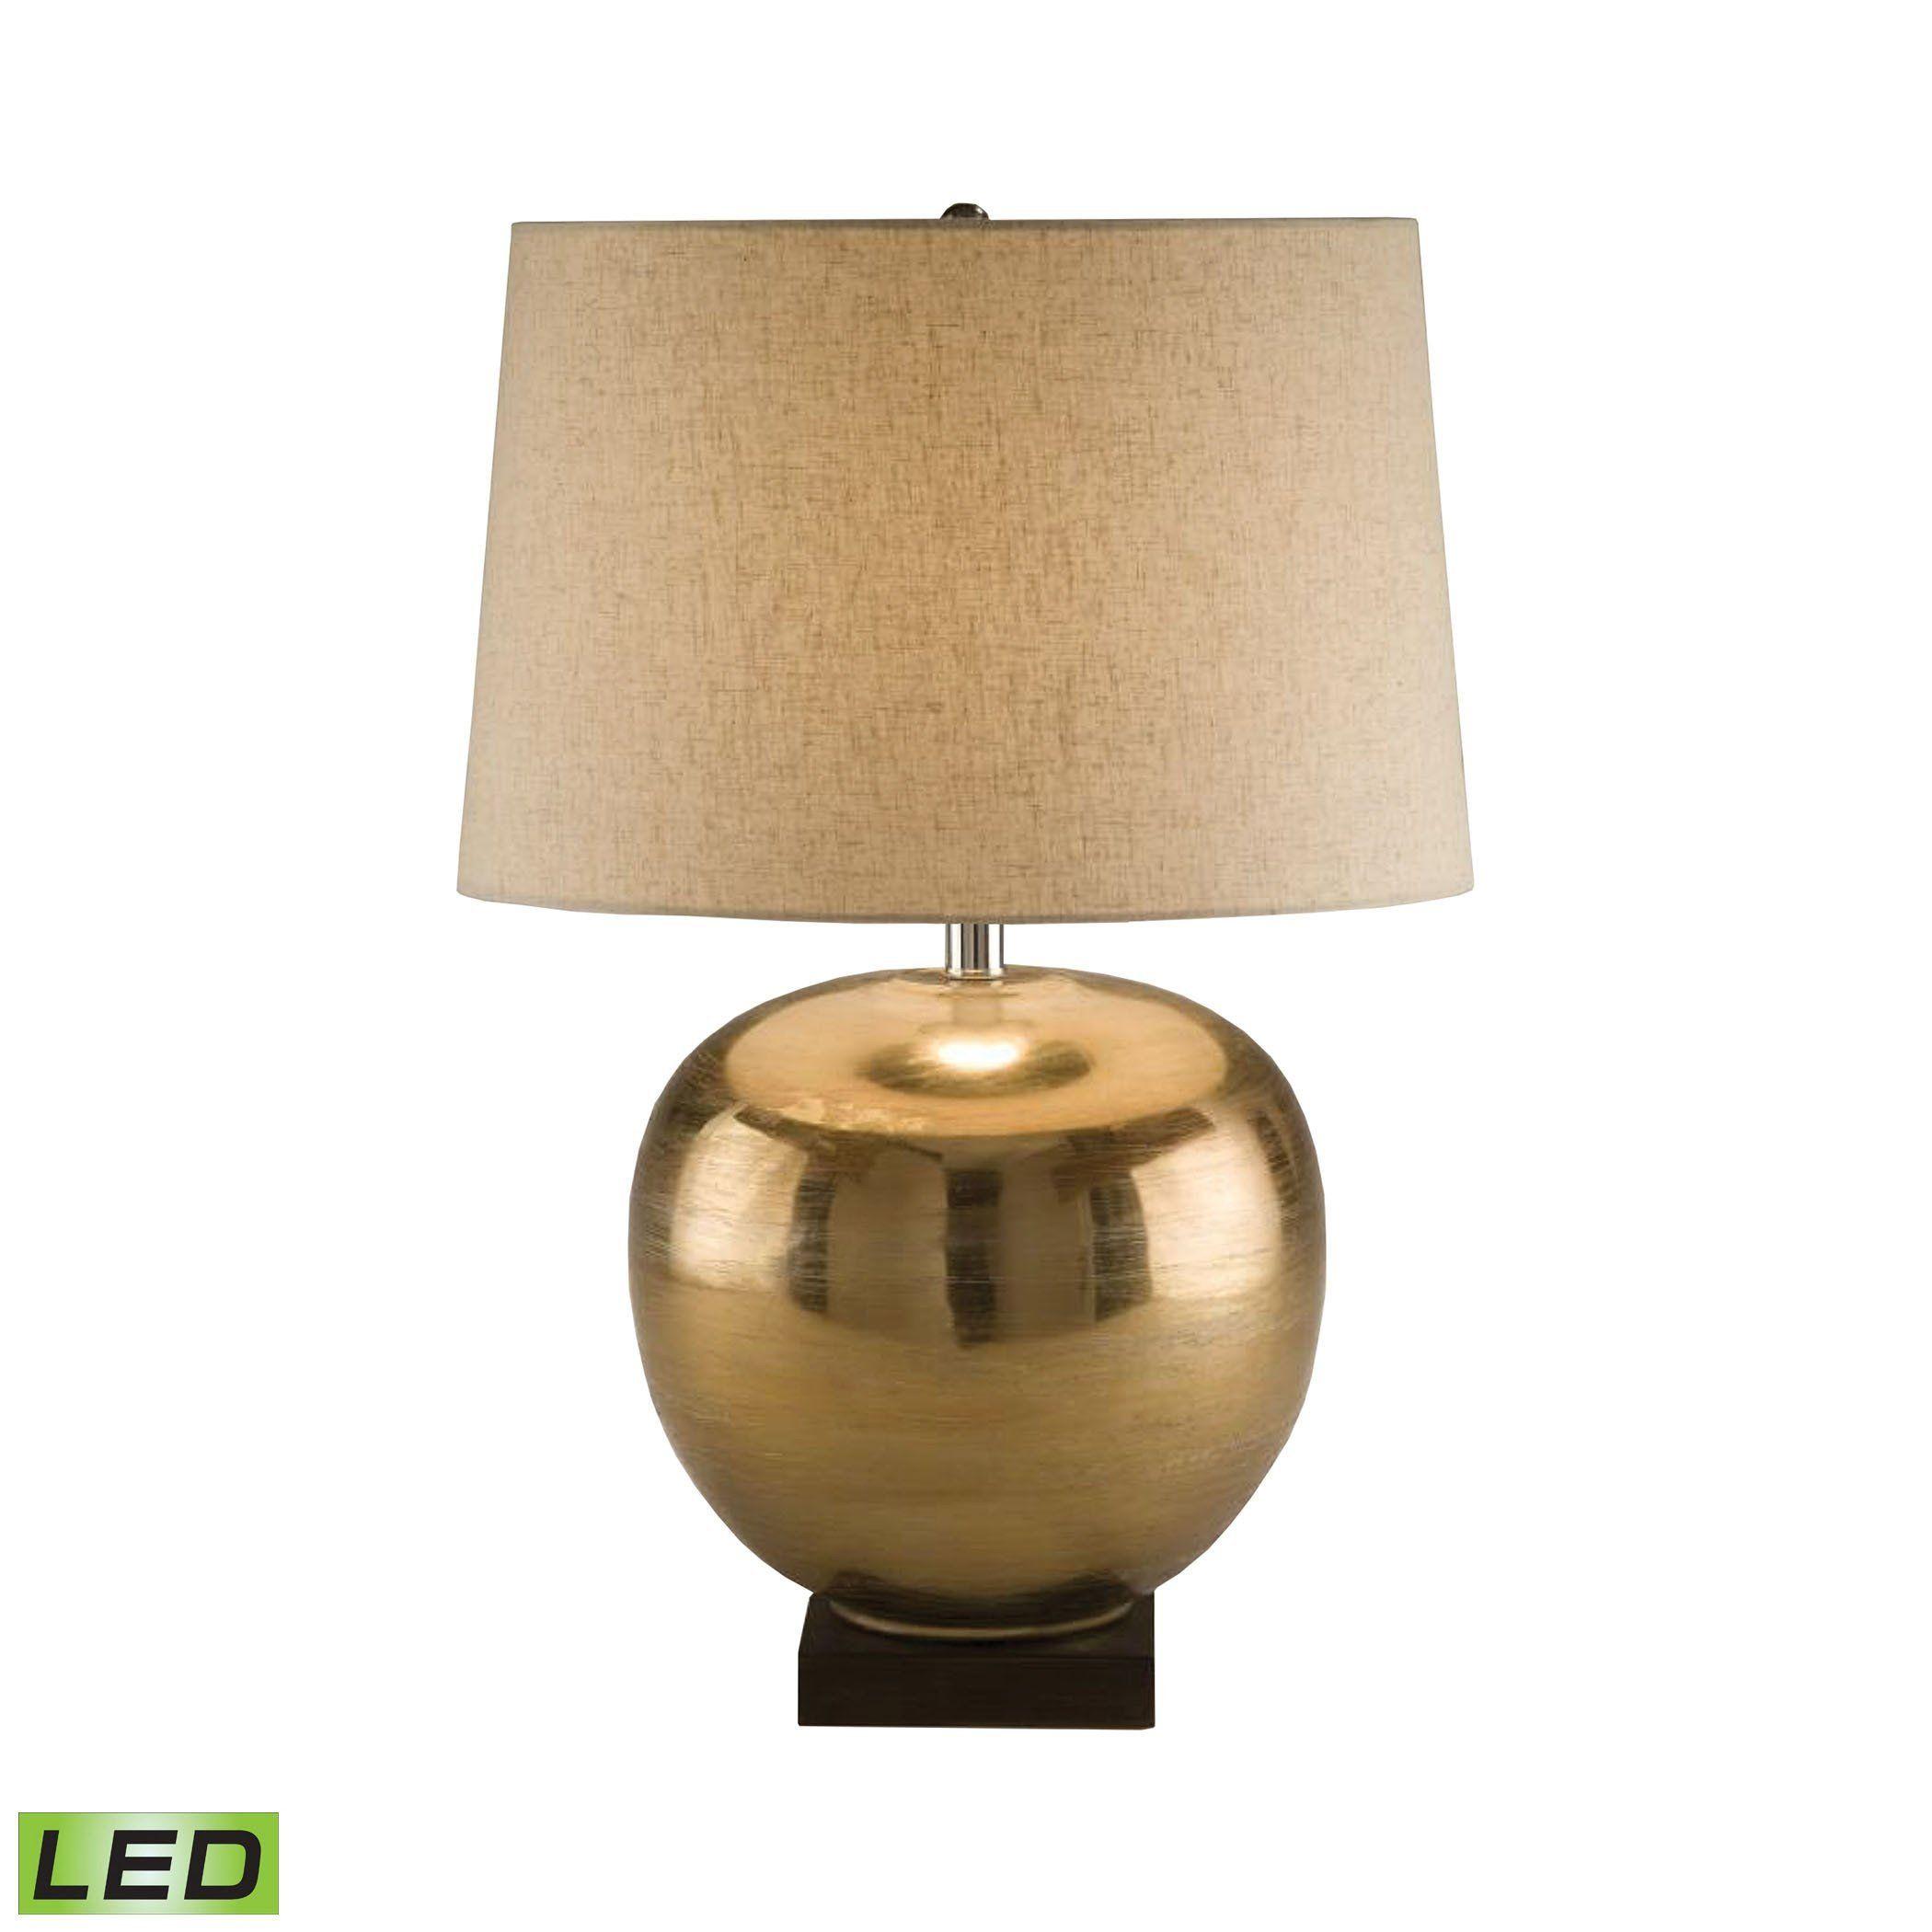 b8acb603c24bd1a9cfbe8227206e22c4 Wunderschöne Led Lampen 100 Watt Dekorationen